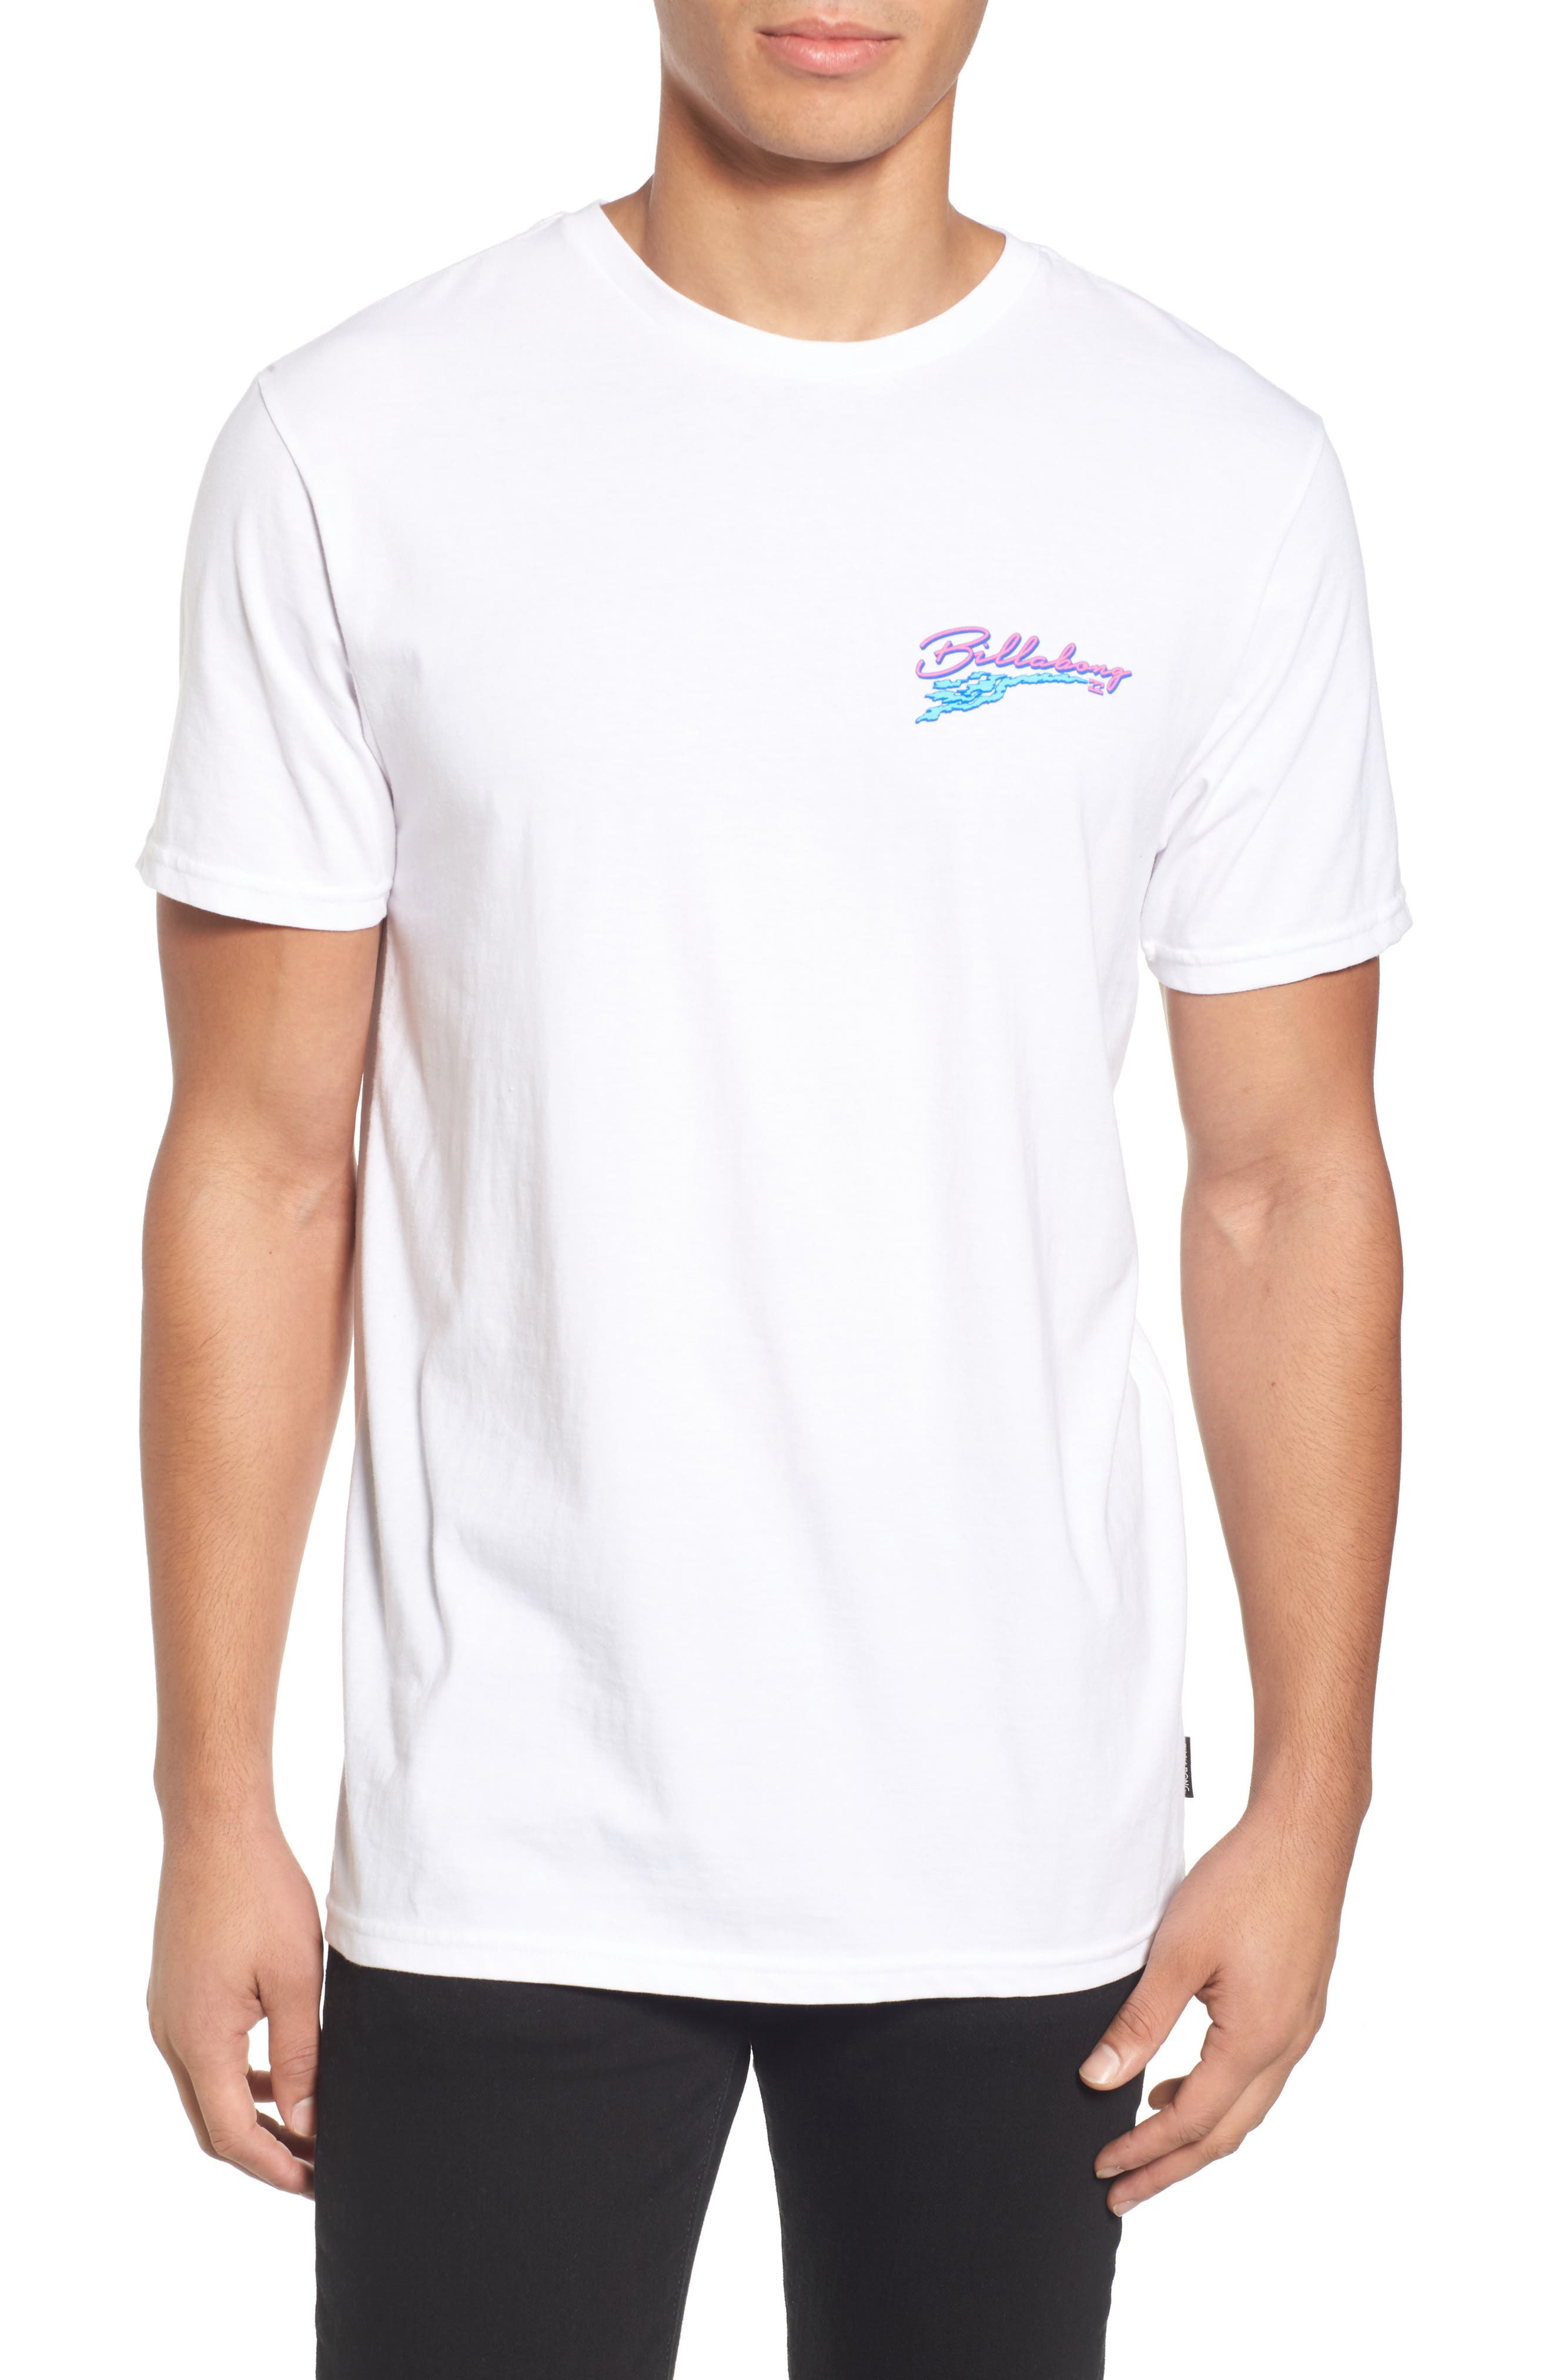 Pigdog T-Shirt,                         Main,                         color,